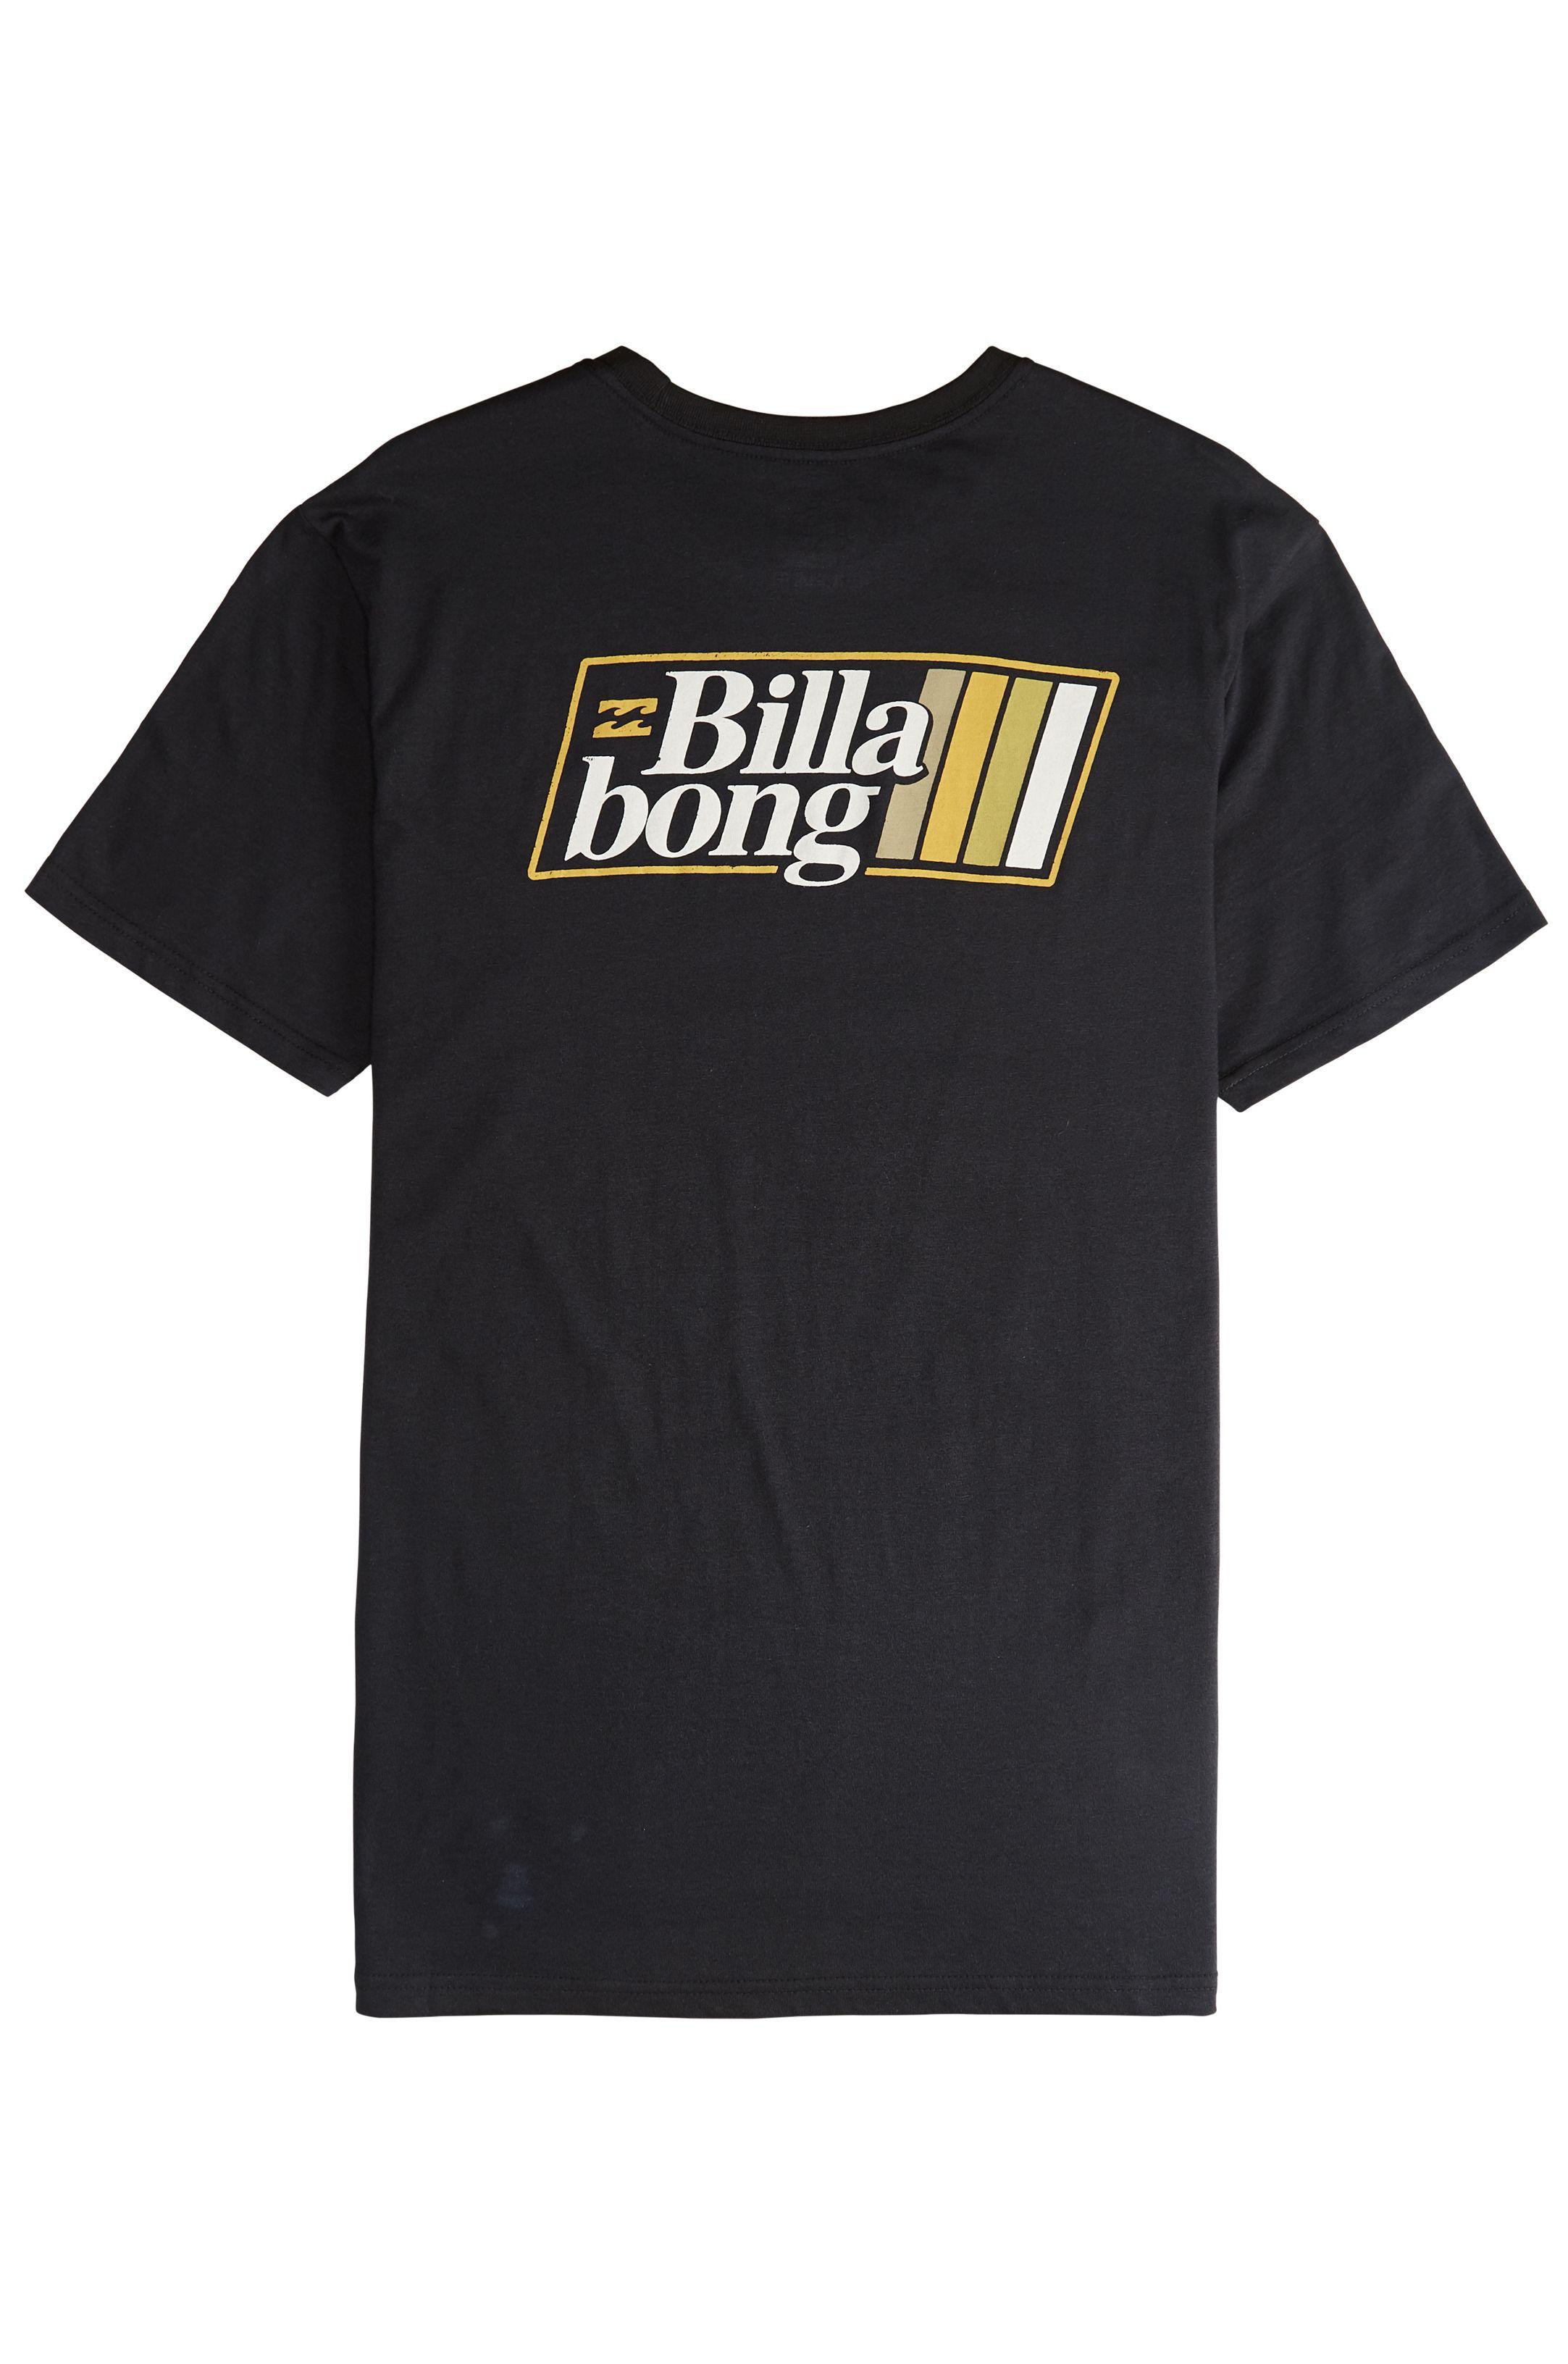 T-Shirt Billabong SUPER 8 Black